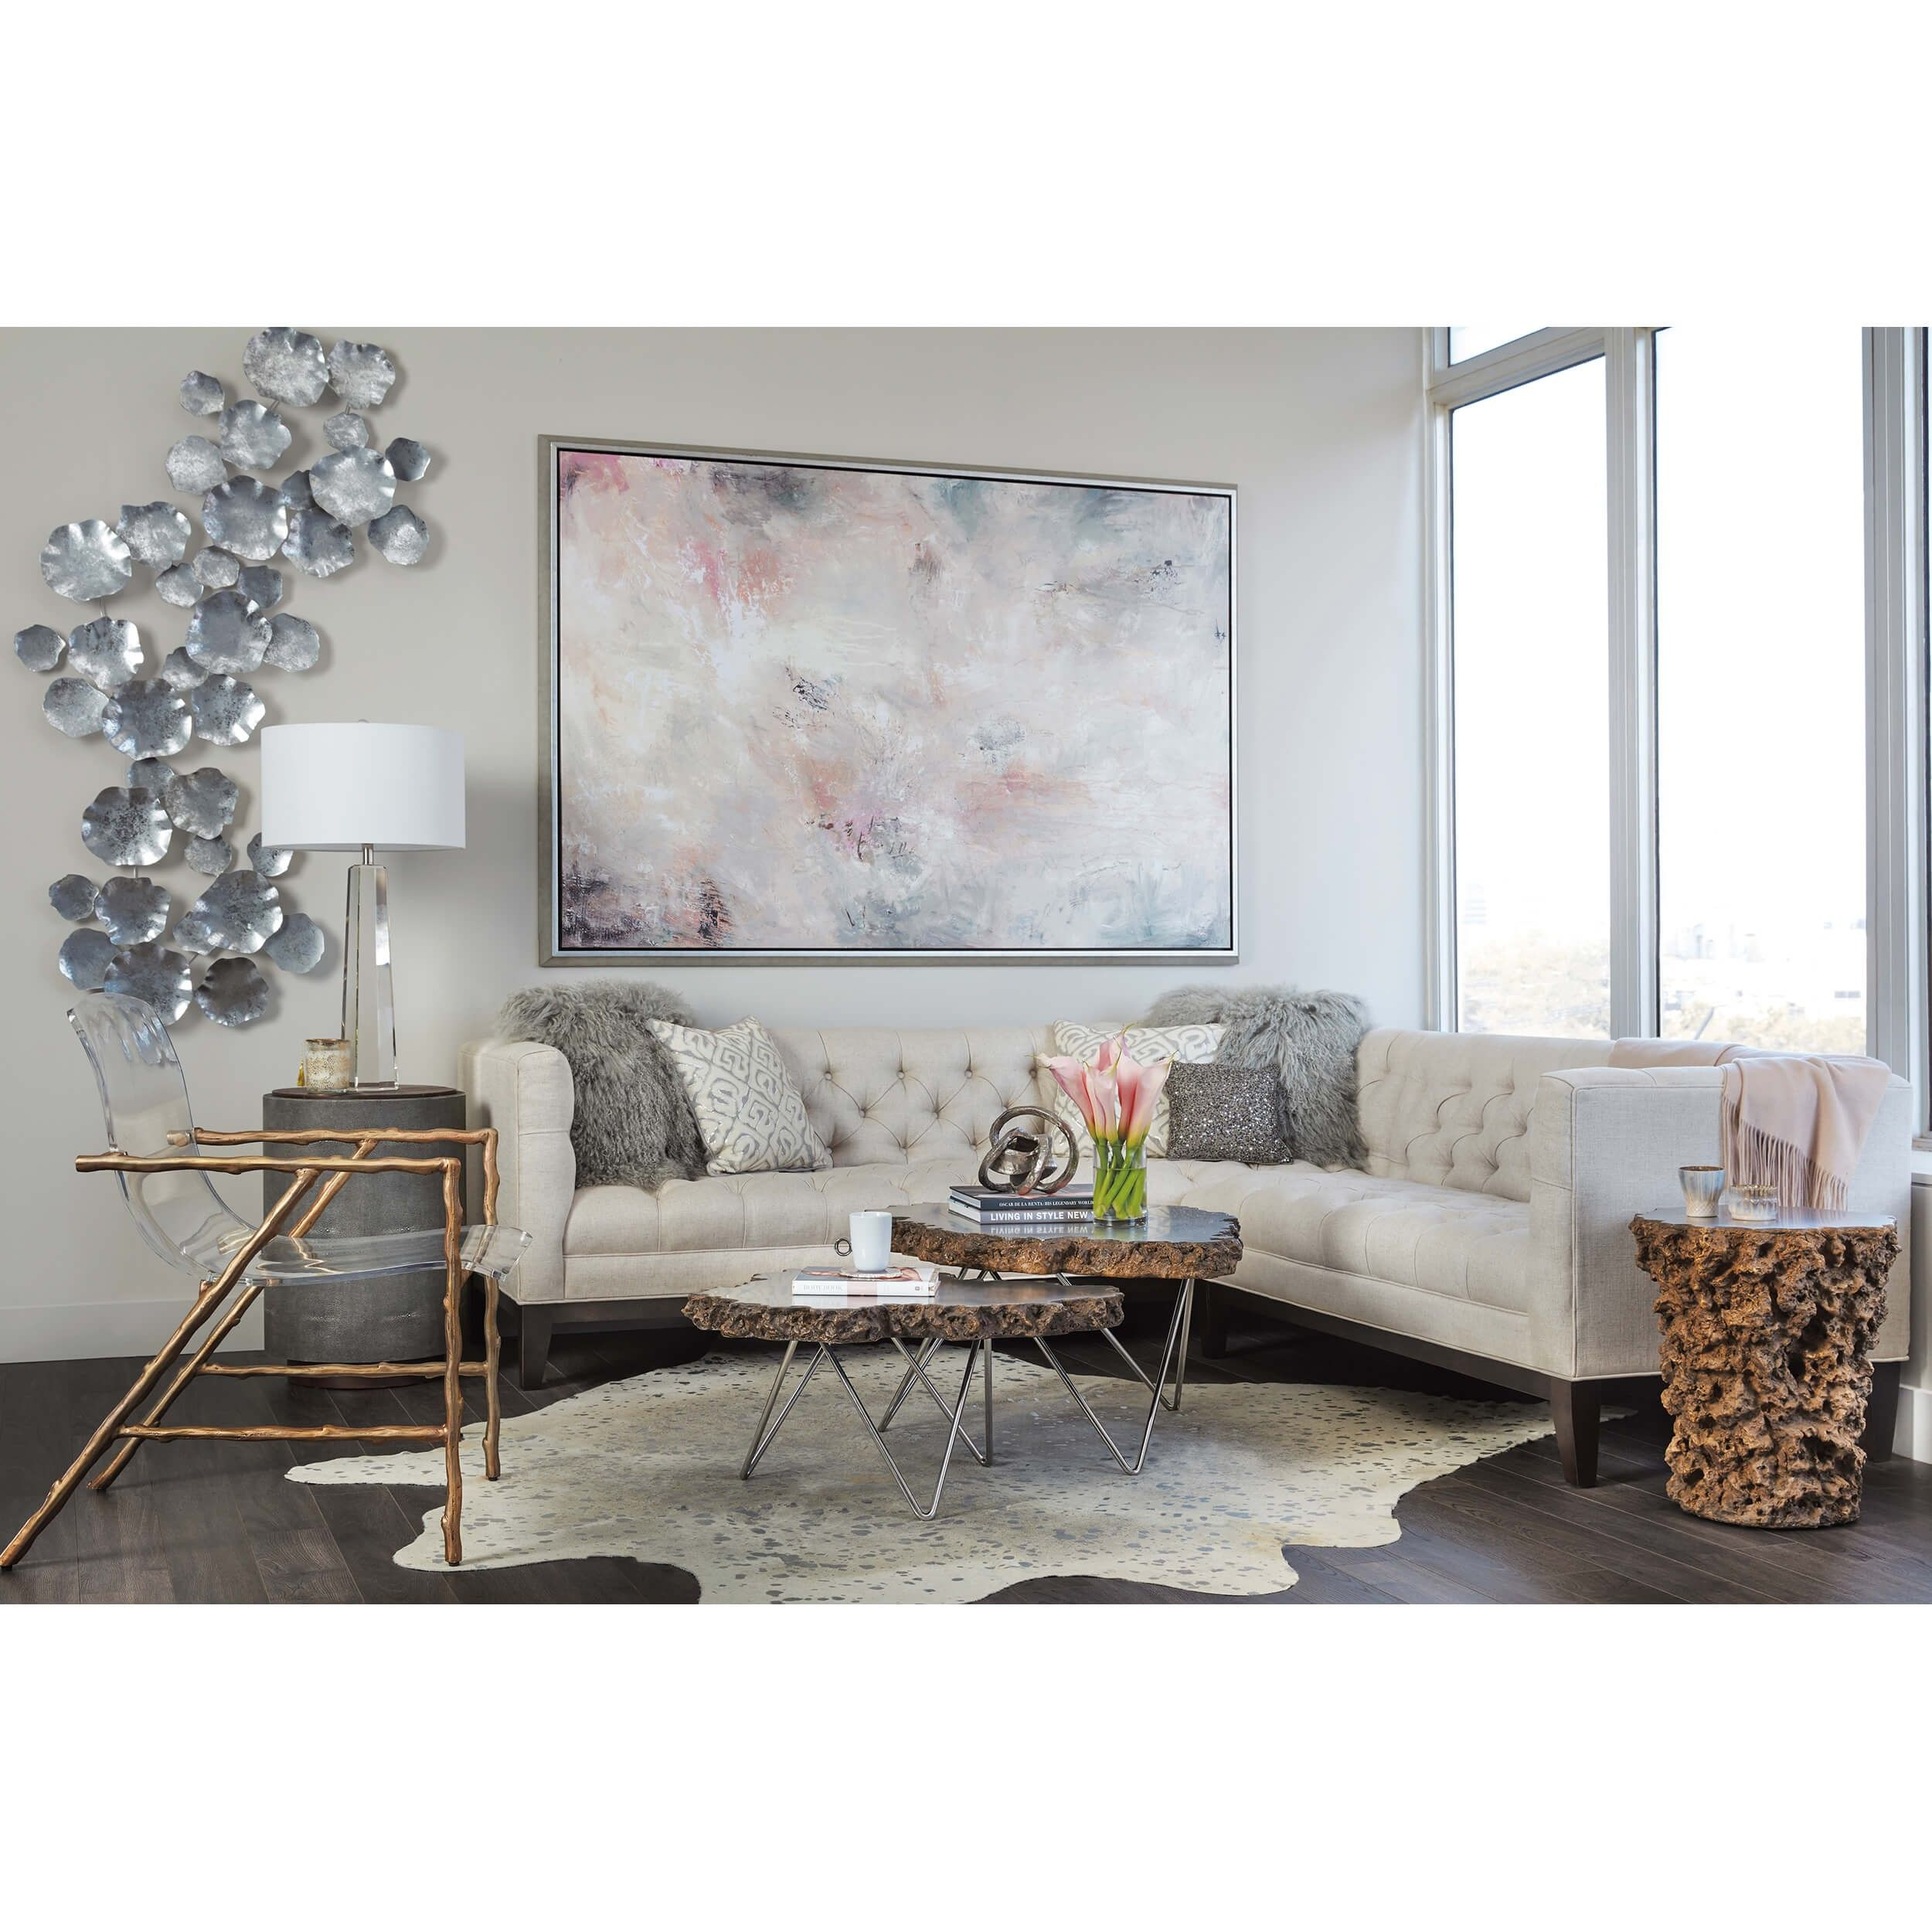 Dillard Acrylic Chair, Faux Bois Luxe Fabric Chairs